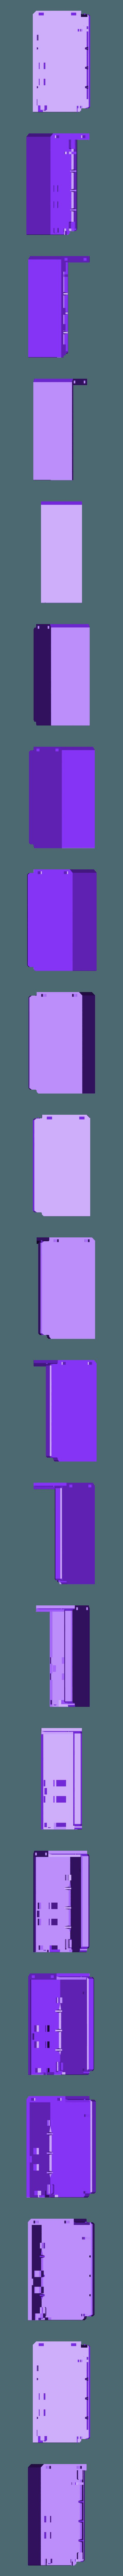 dasaki_ramps_enclosure_base_mountless.stl Télécharger fichier STL gratuit Dasaki Ramps 1.4 Boîtier / Boîte / Boîtier • Plan pour impression 3D, dasaki